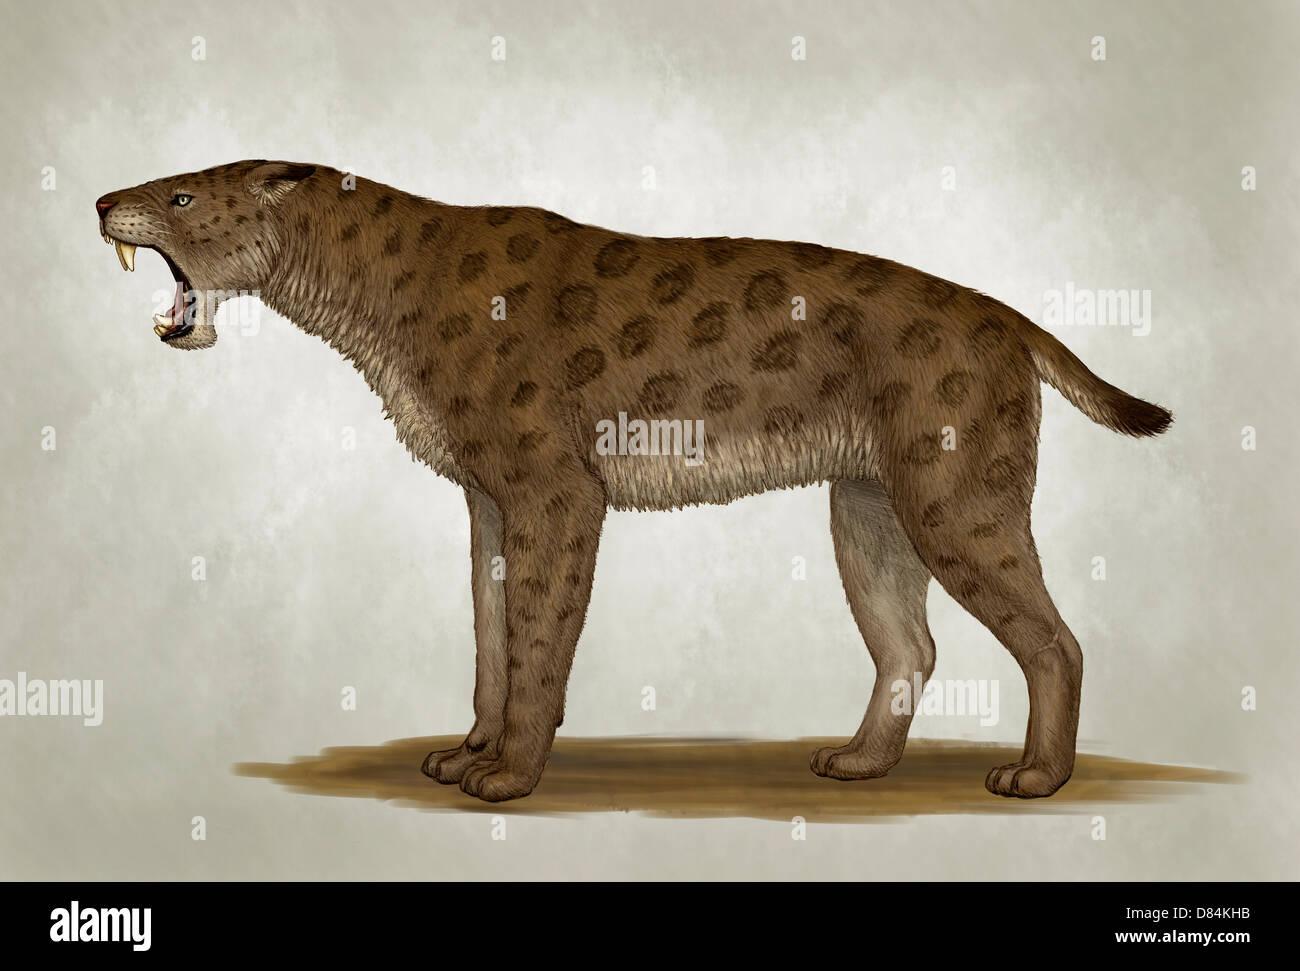 Homotherium latidens, a big sabertooth cat of the Pliocene Epoch. - Stock Image